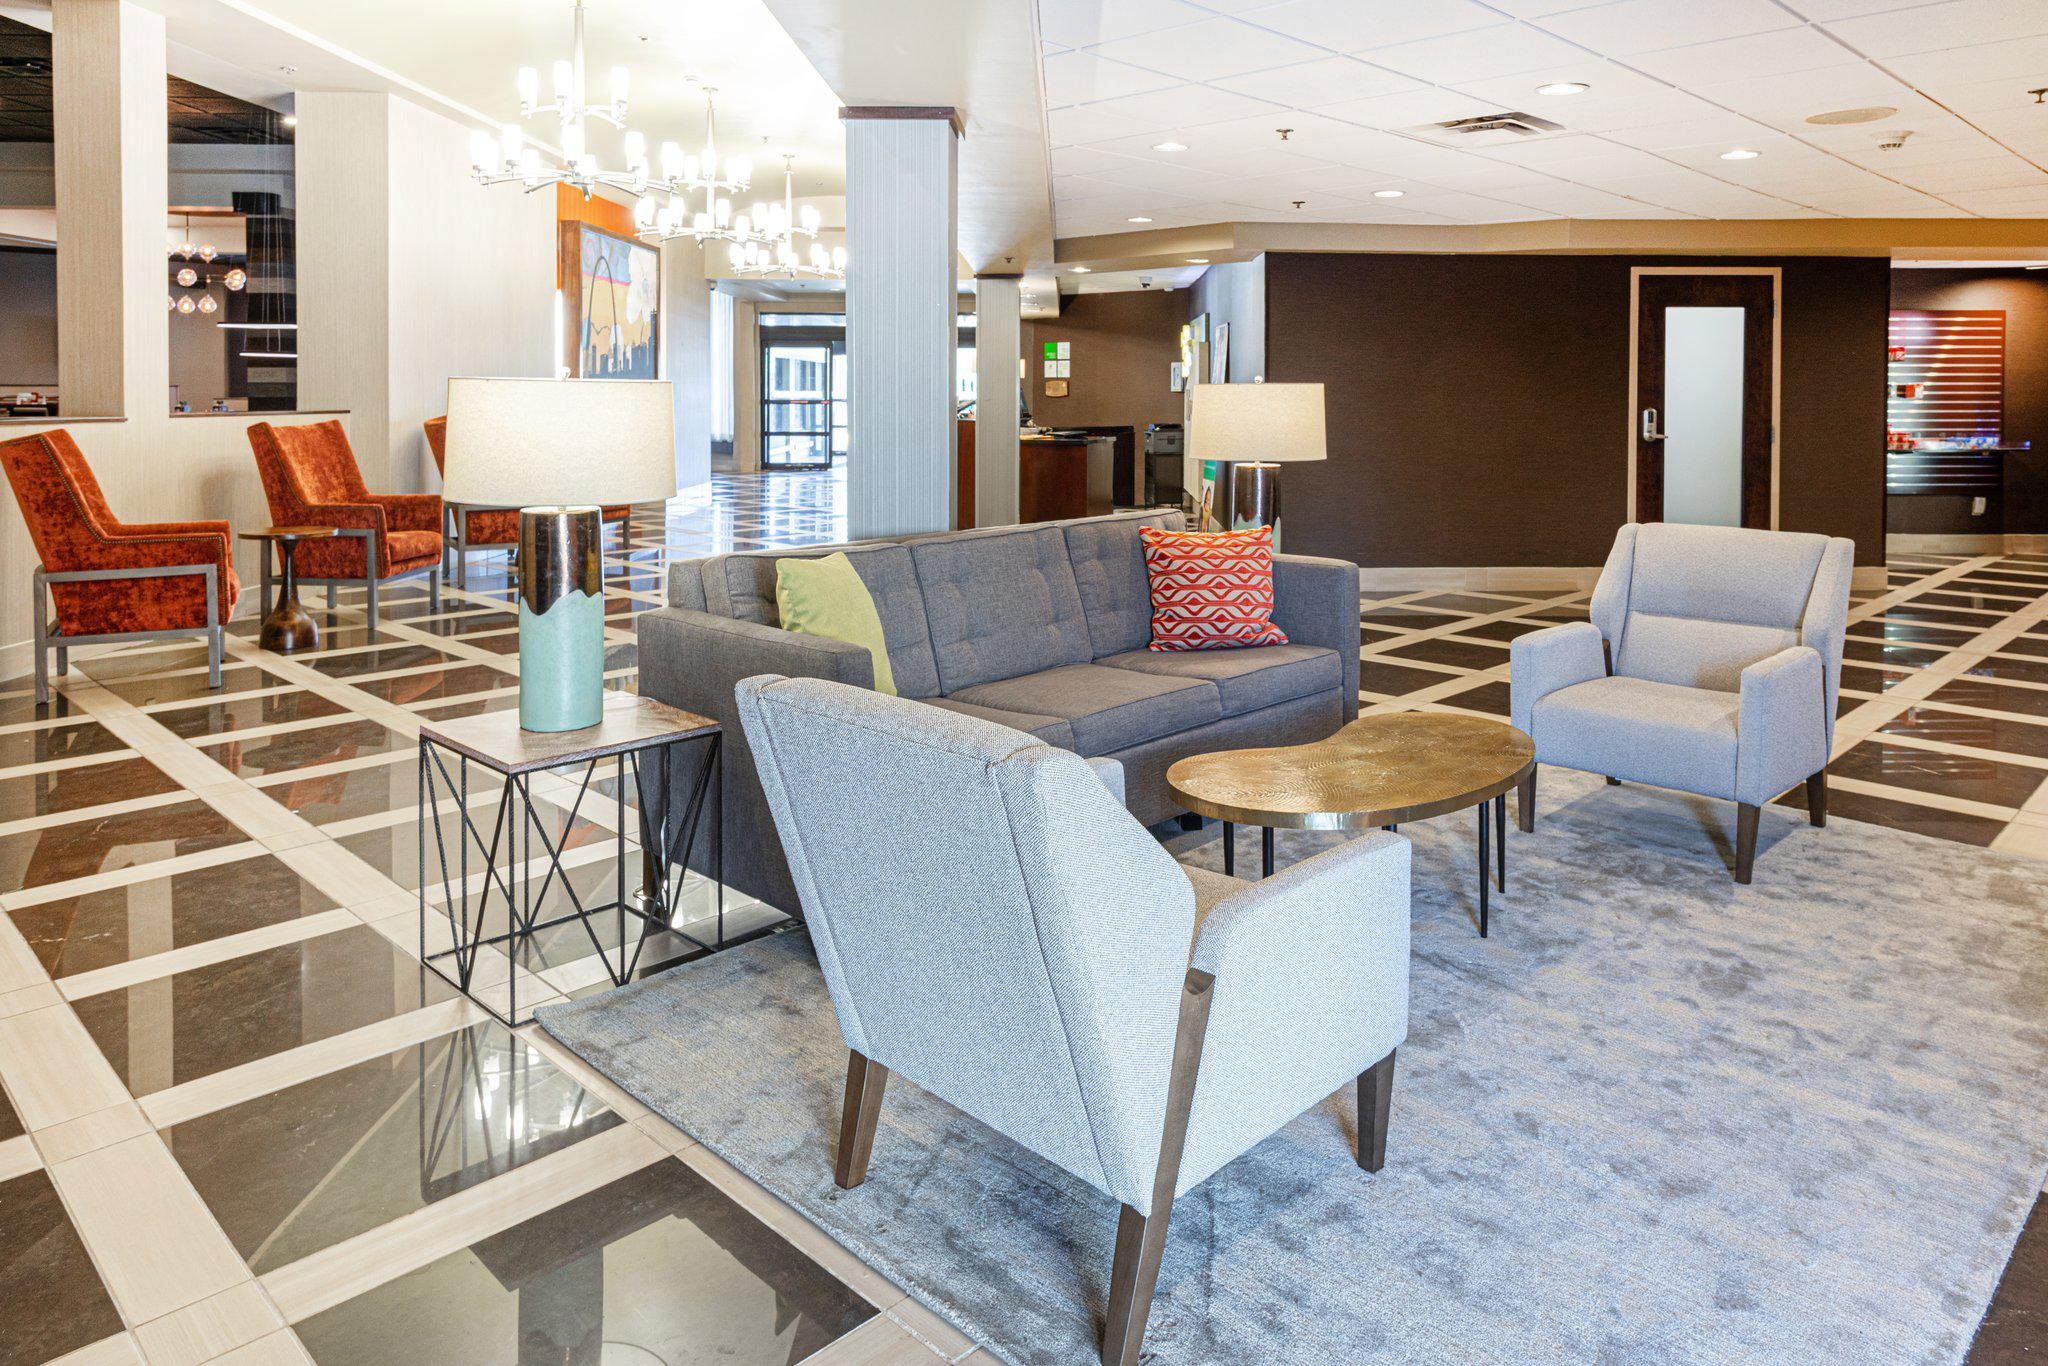 Holiday Inn St. Louis Arpt West-Earth City, an IHG Hotel